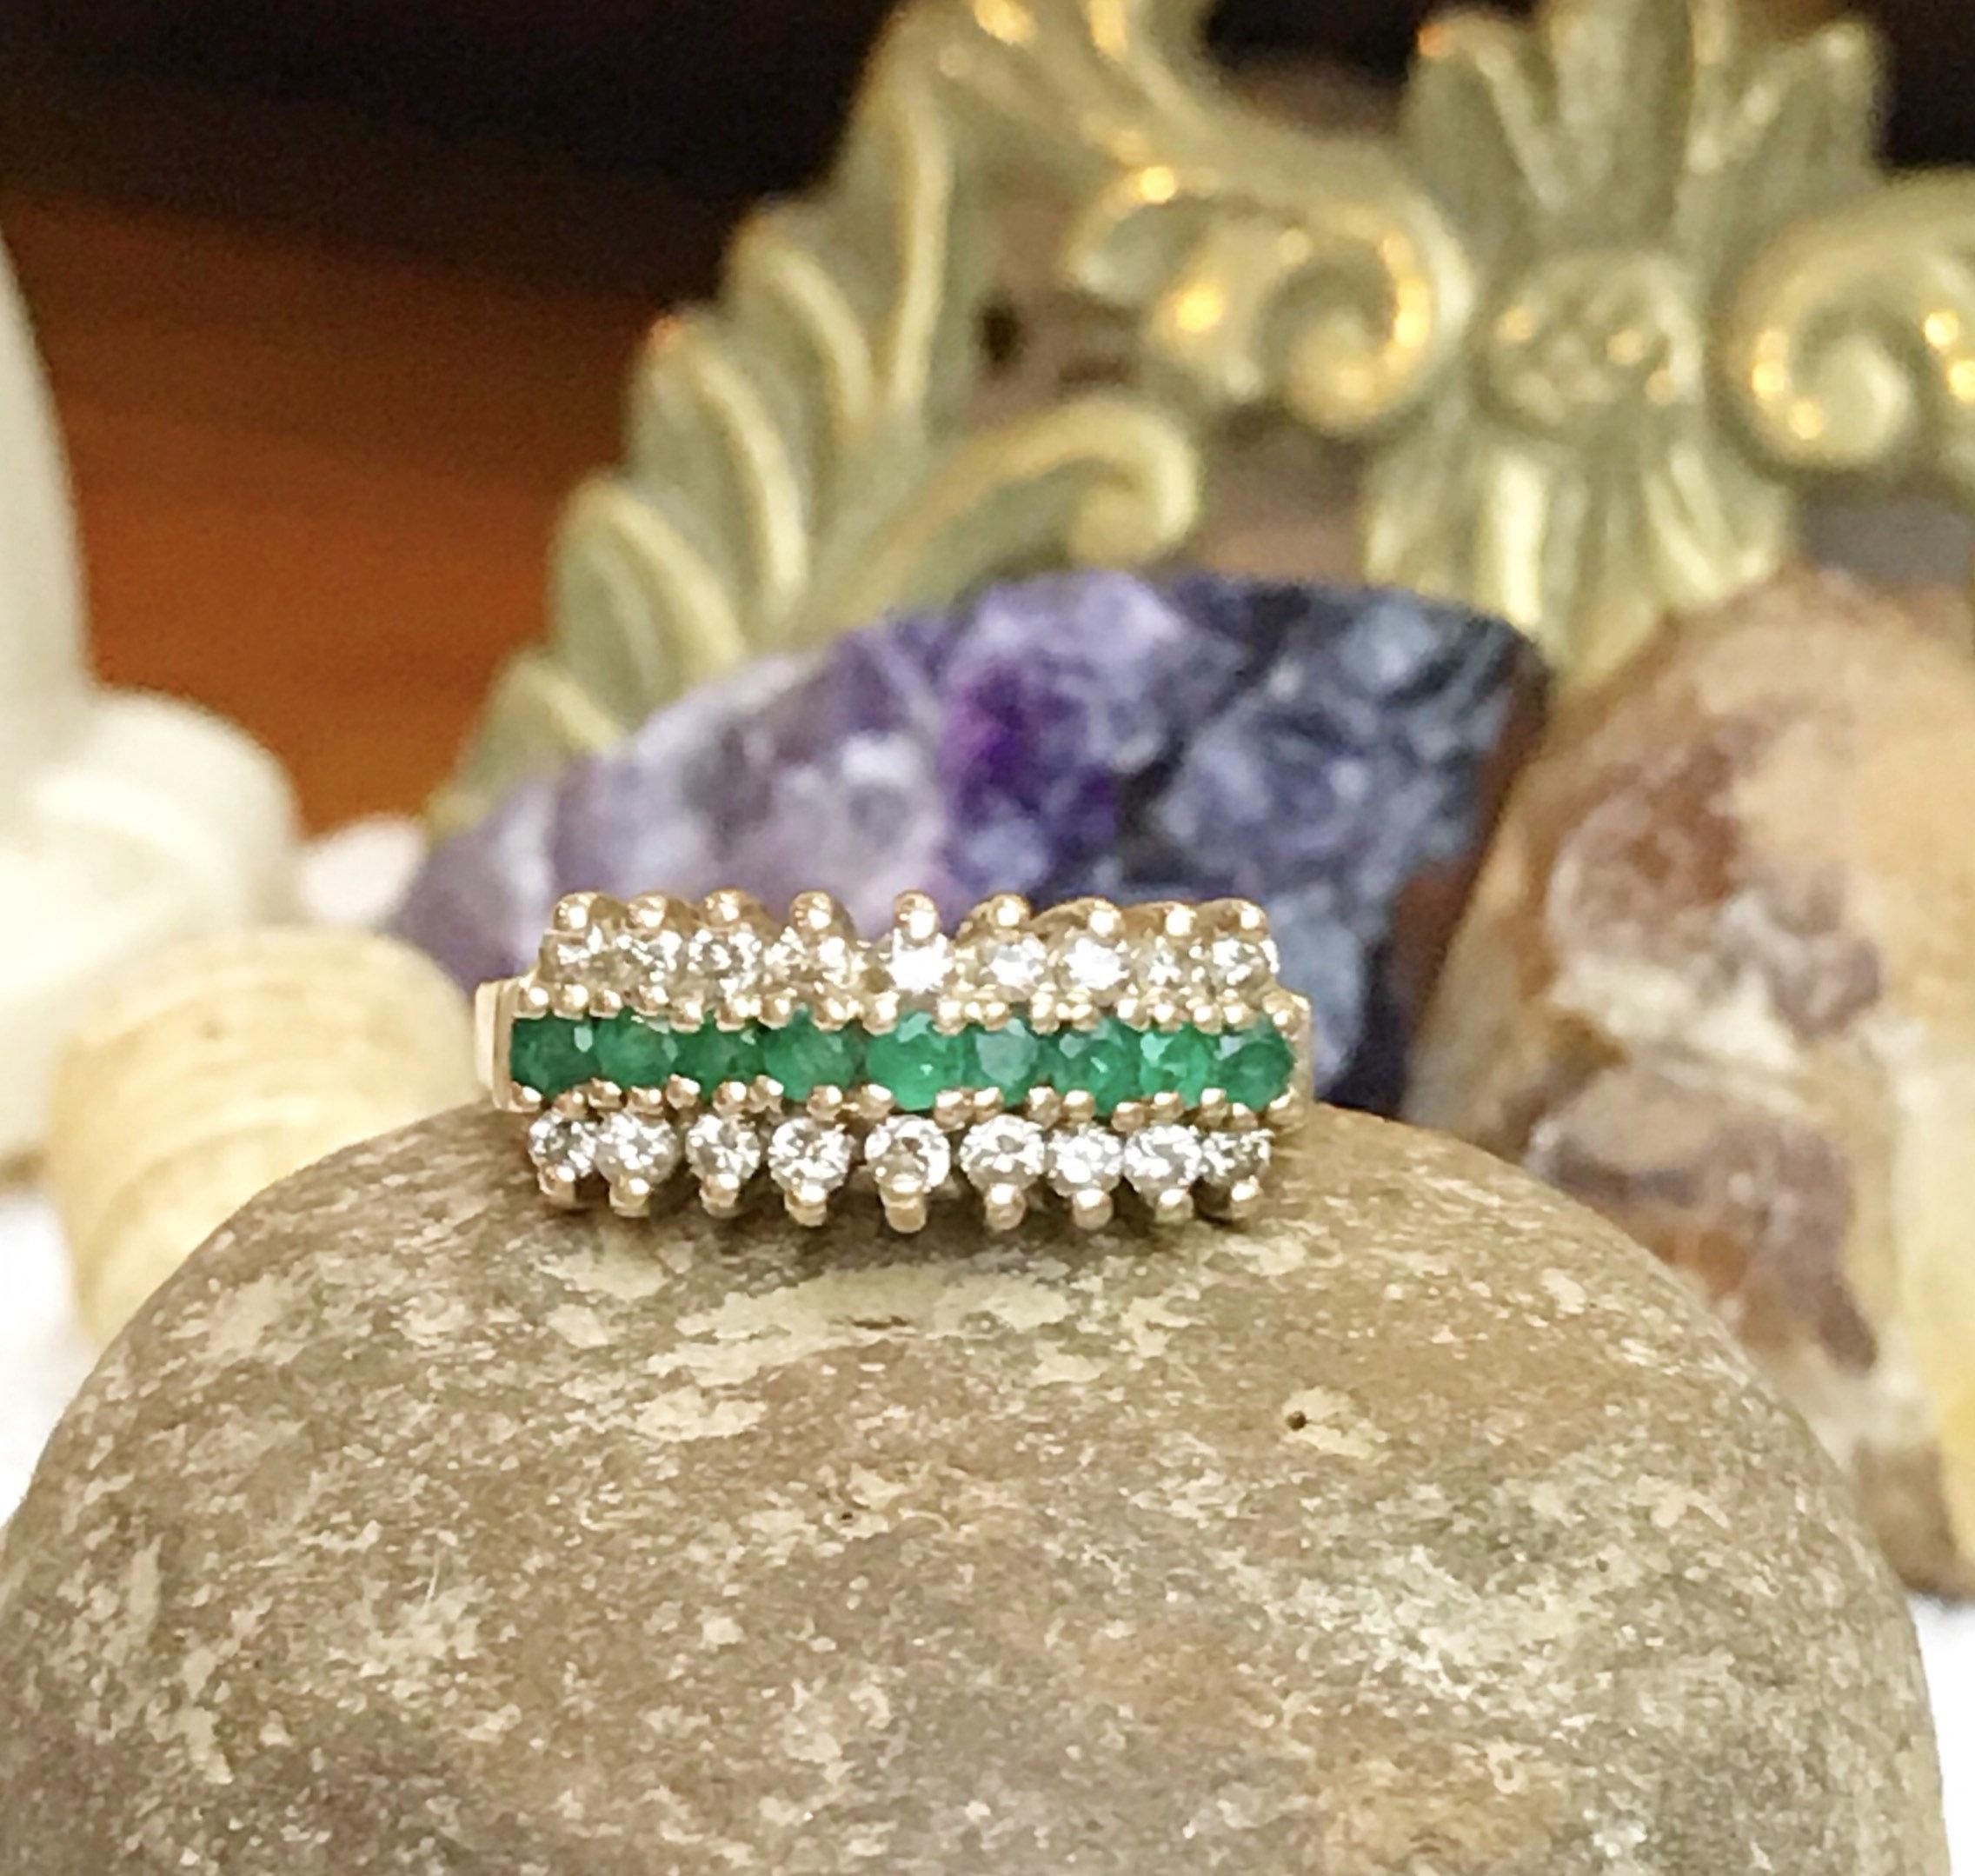 Vintage 14K Yellow Gold Three Row Emerald & Diamond Pyramid Ring, 14K Gold  3 Row Round Emerald And Diamond Tiara Anniversary Ring,  (View 20 of 25)